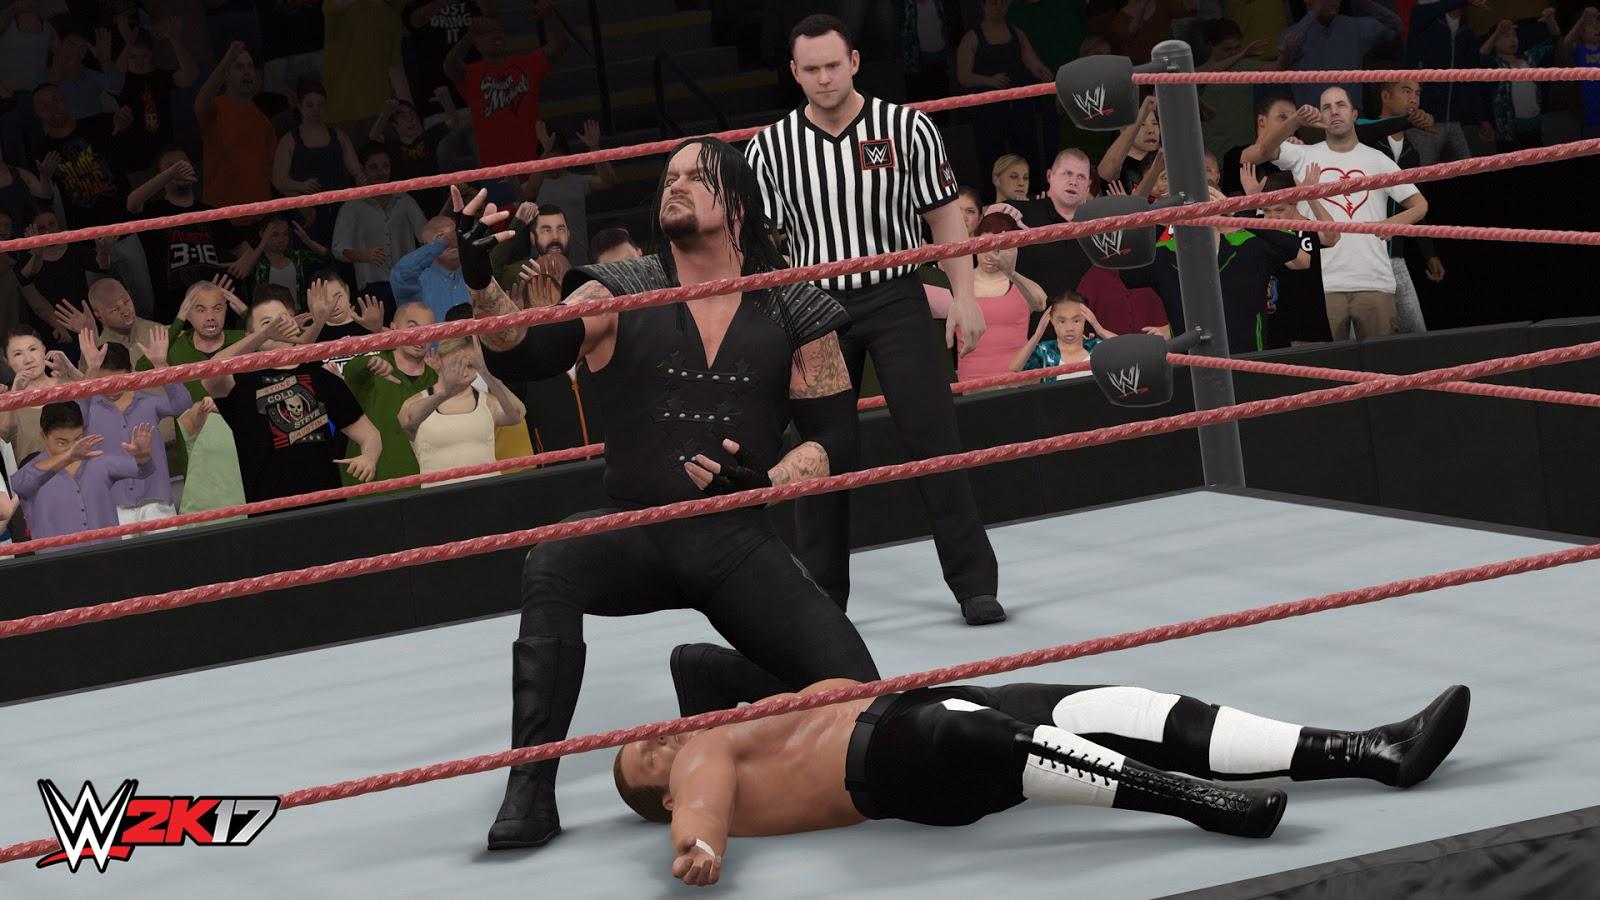 WWE 2K17 ESPAÑOL PC Descargar Full (CODEX) + REPACK 10 DVD5 (JPW) 4